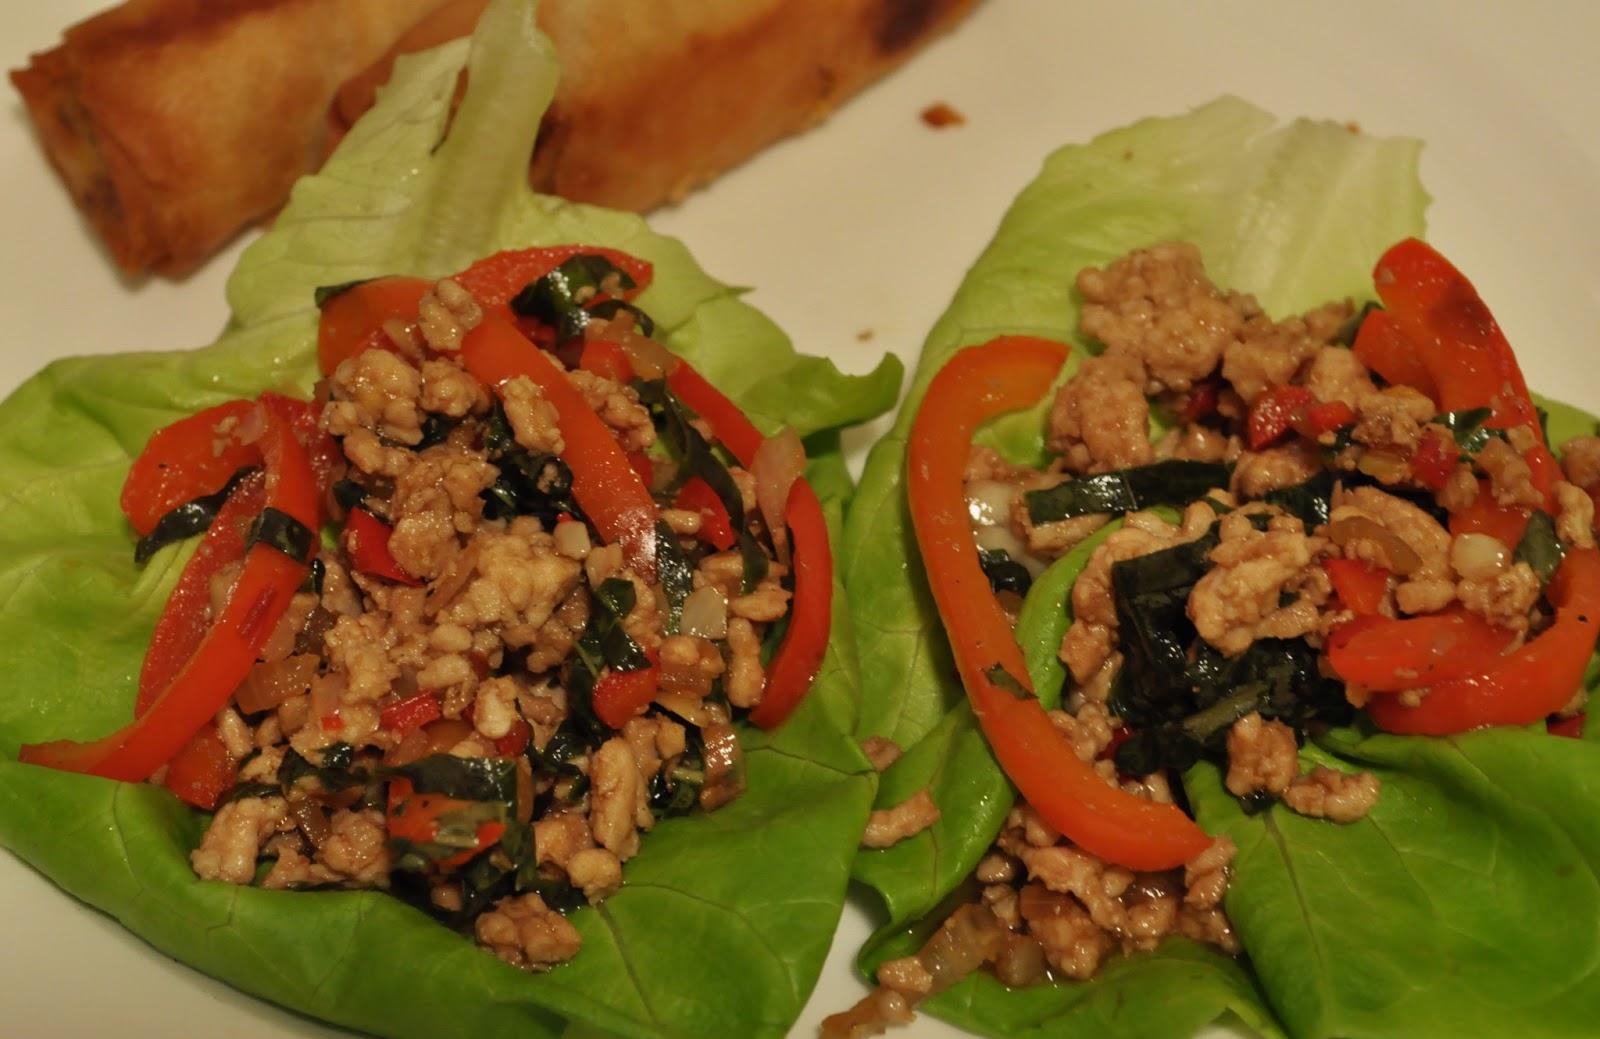 My Tiny Oven: Thai Turkey and Basil Lettuce Wraps